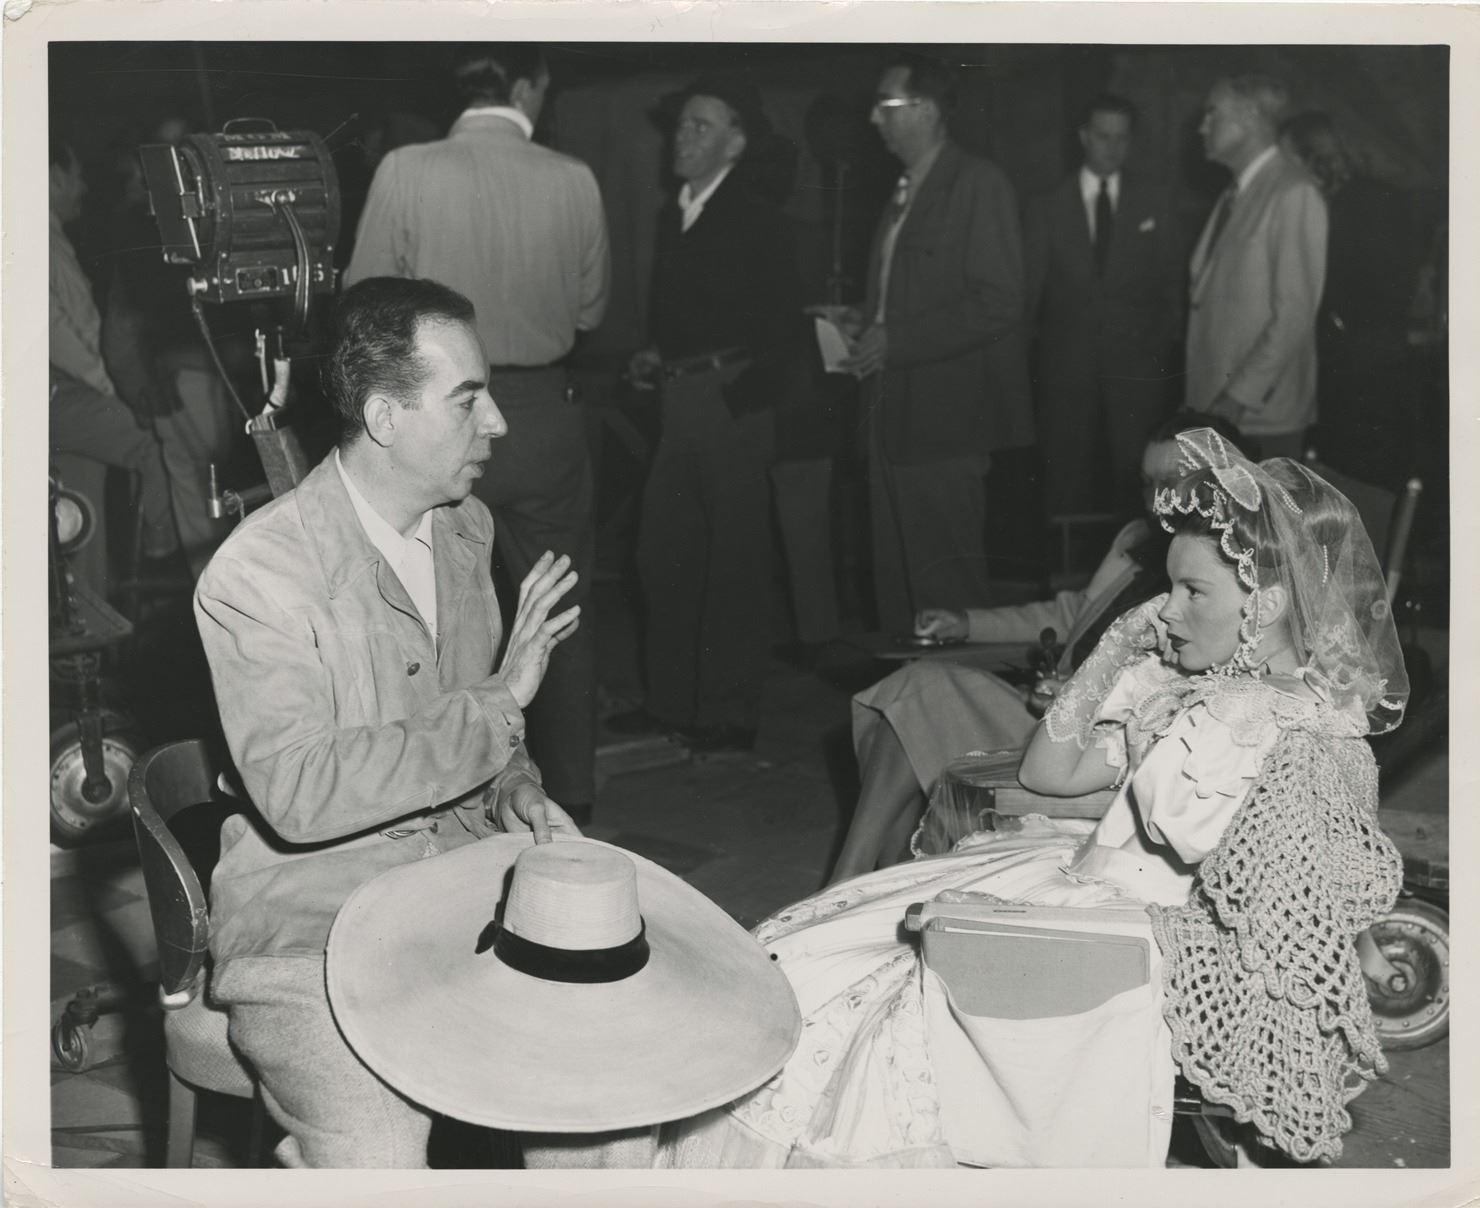 Judy Garland (13) vintage photographs in Vincente Minnelli